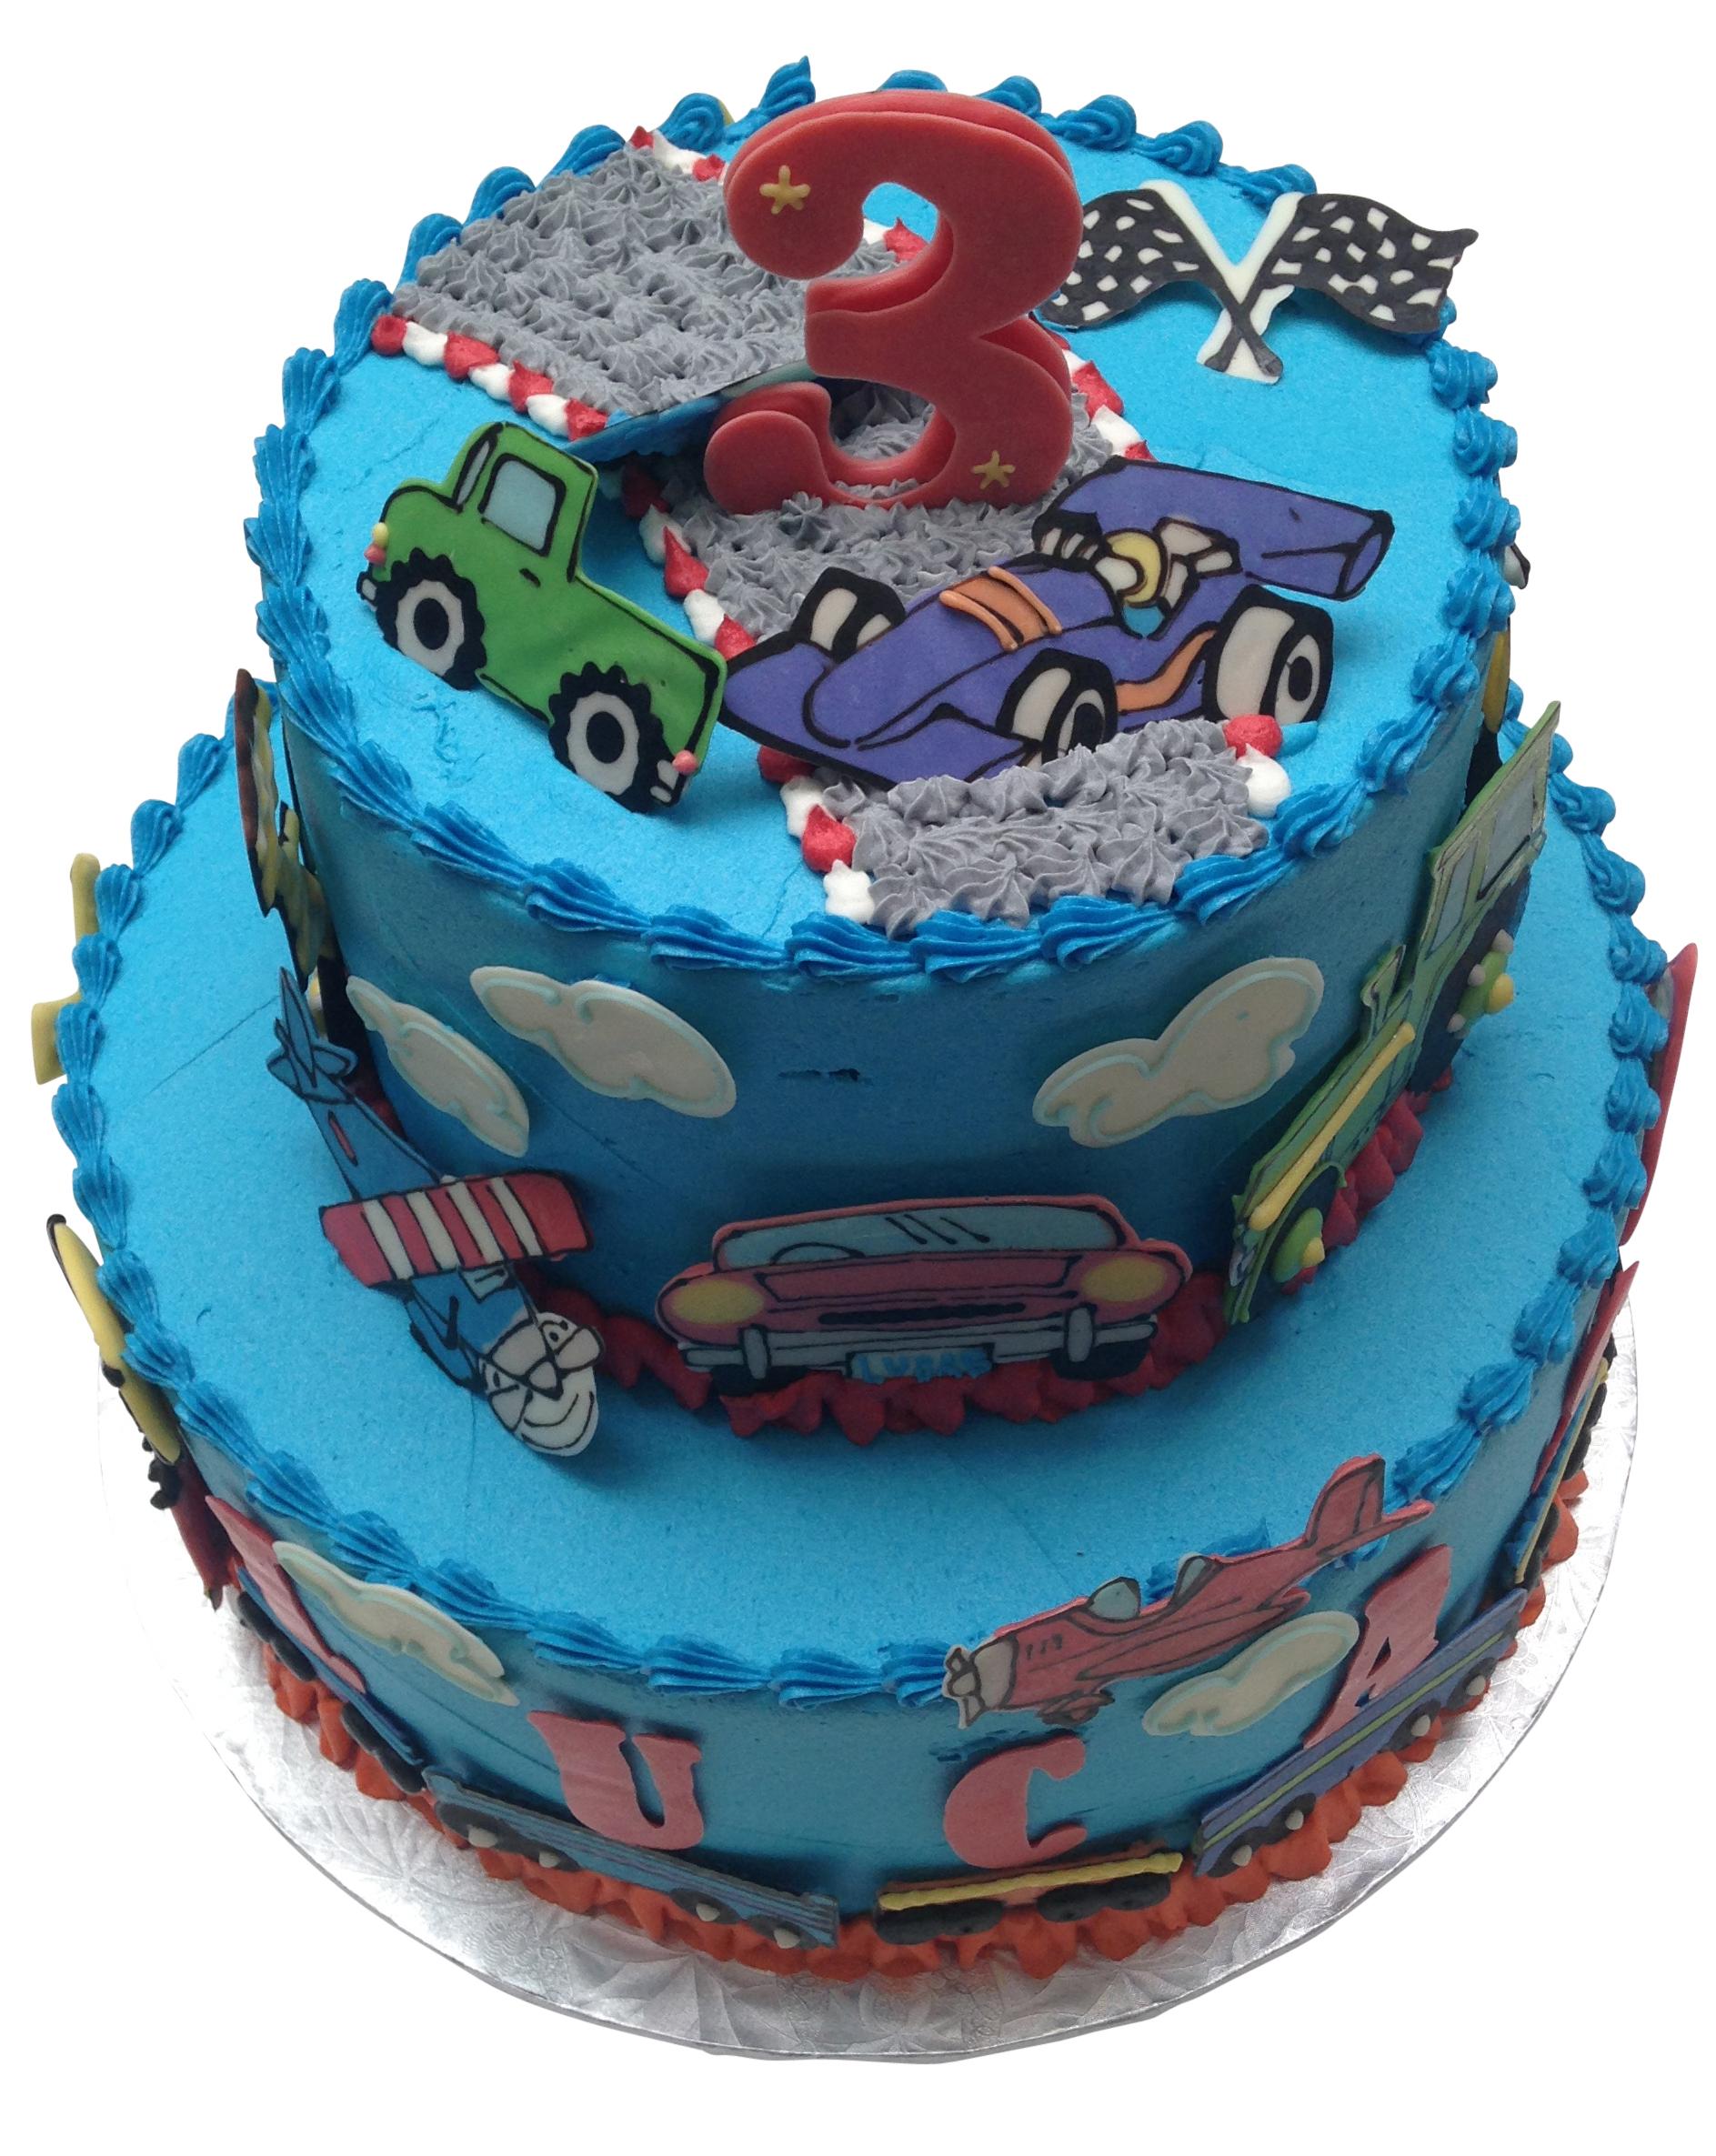 BeBe-Cakes-Vehicle-9-Cake.jpg